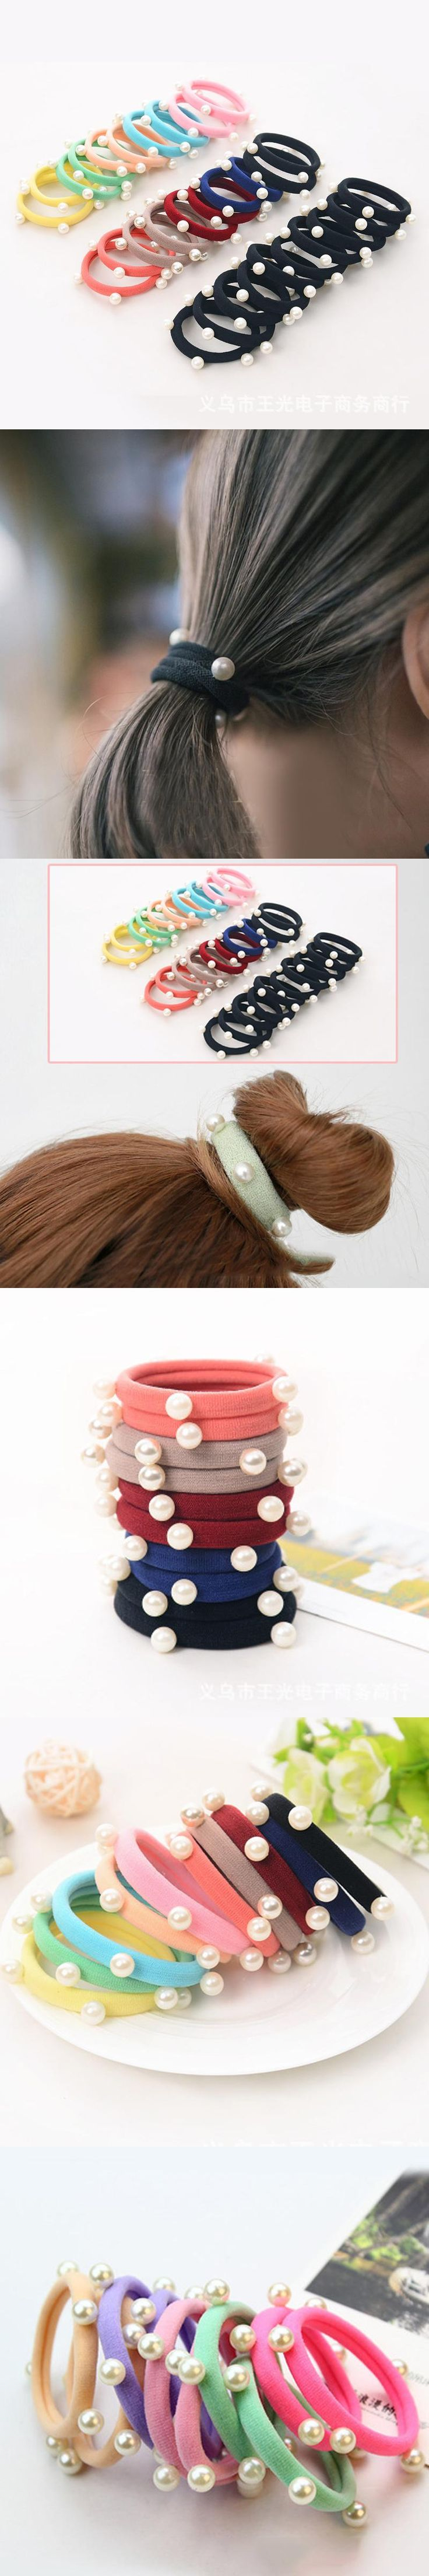 10Pcs Sweet Hair Accessories For Women Girls Retro Ponytail Holder Pearl Stretch Elastic Hair Band Hairband Hair Rope Headwear